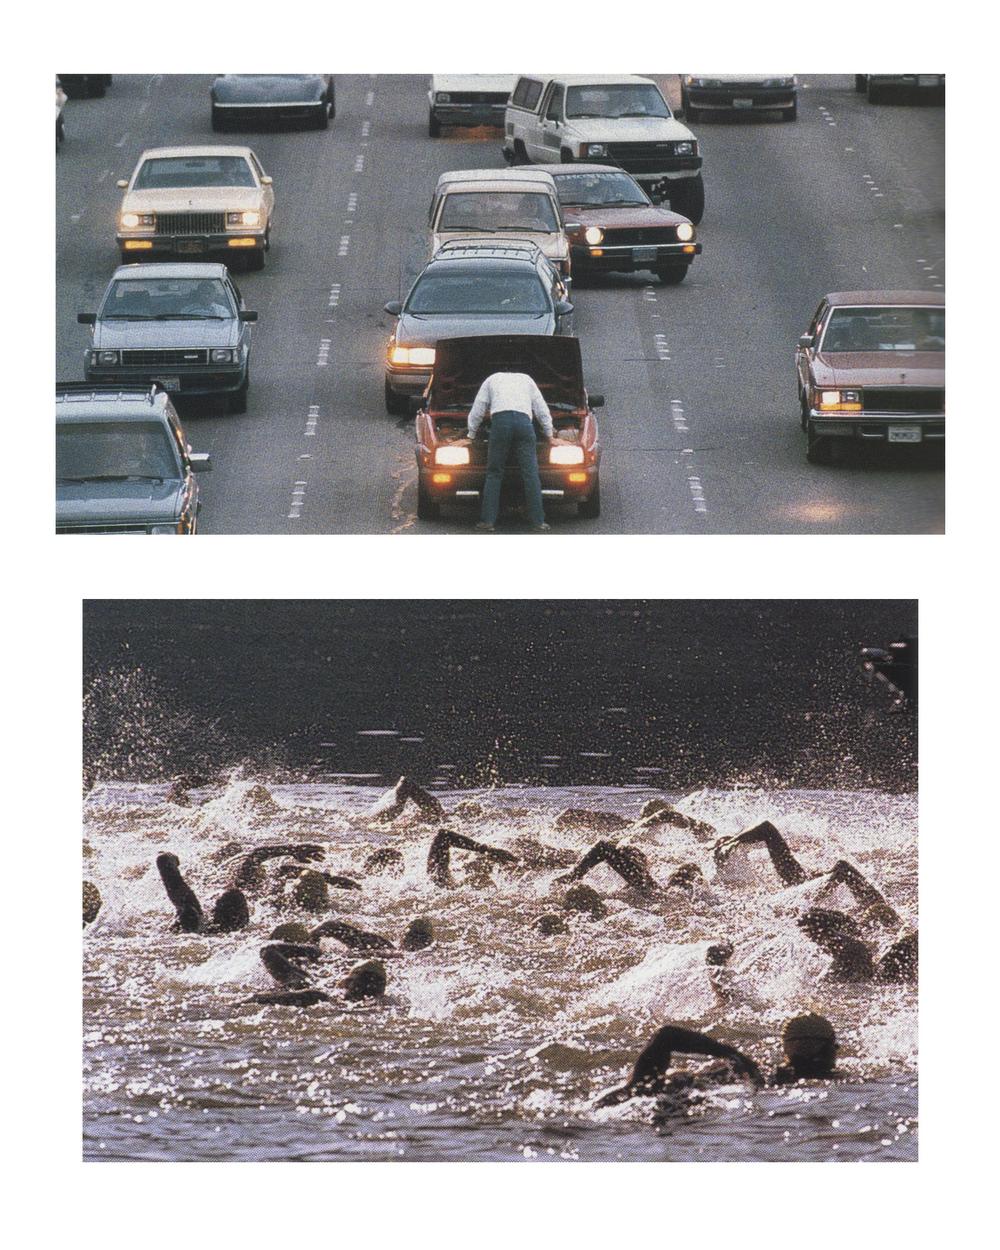 cartrafficandswimmers.jpg